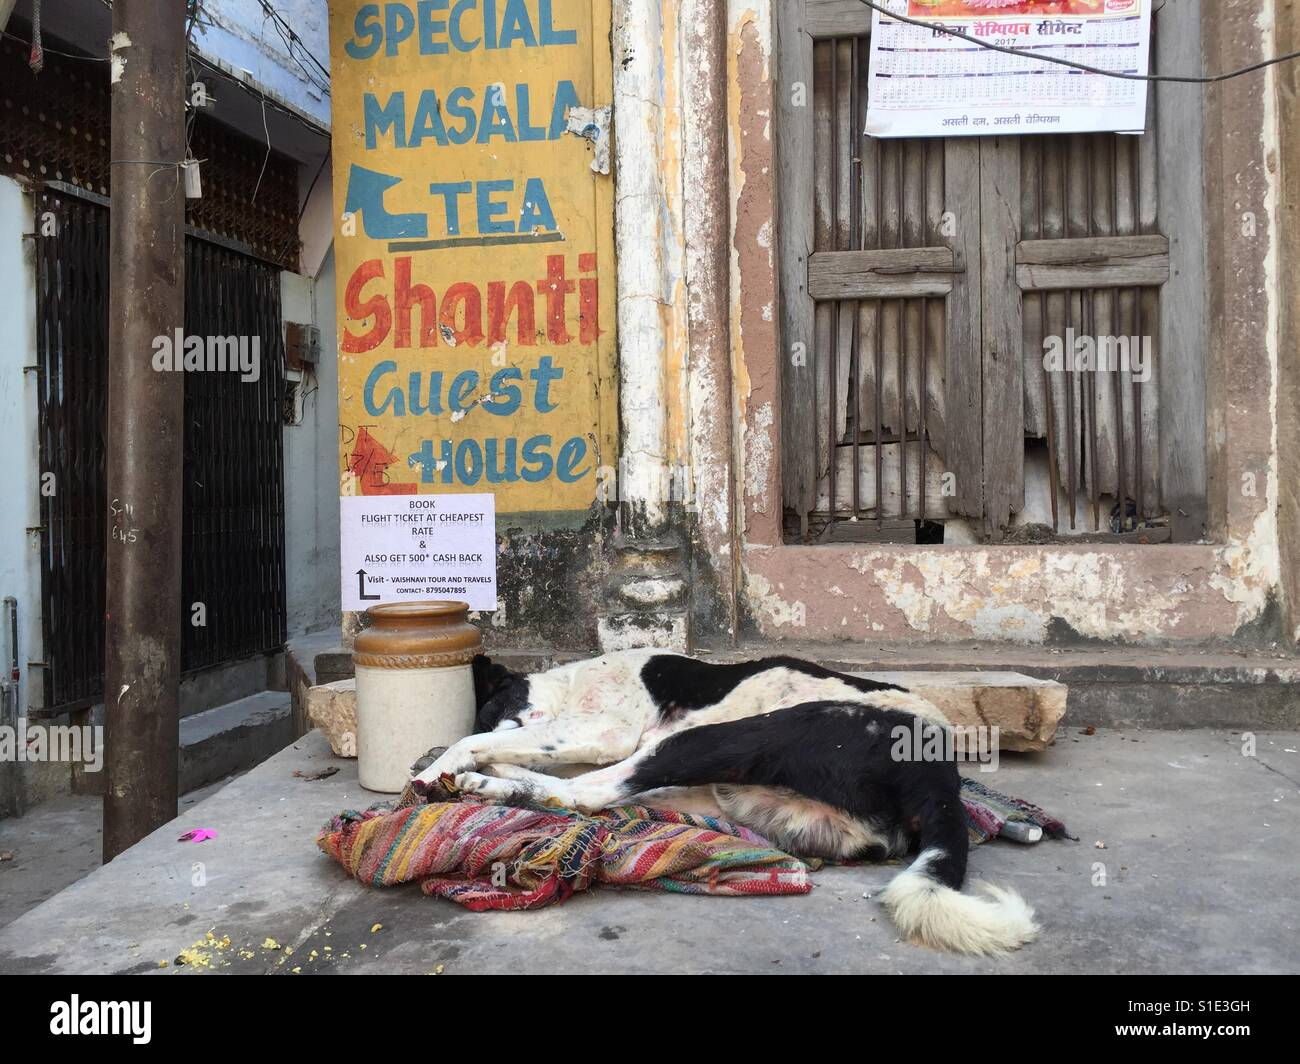 A dog sleeps in the street in Varanasi, India - Stock Image